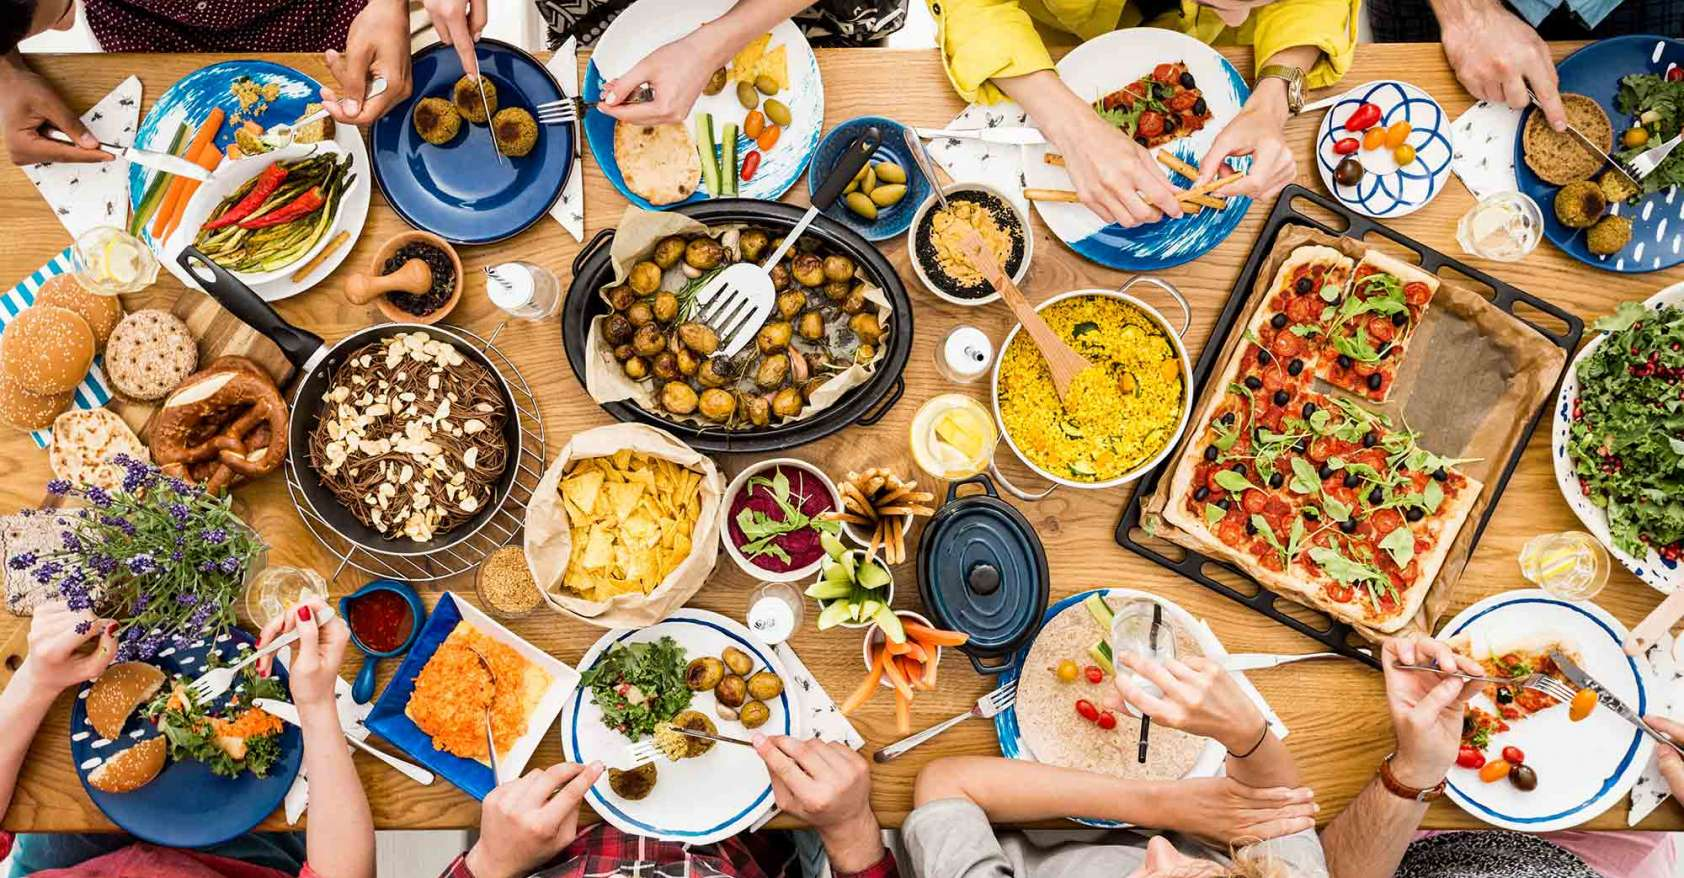 group of people at table eating vegetarian/vegan options